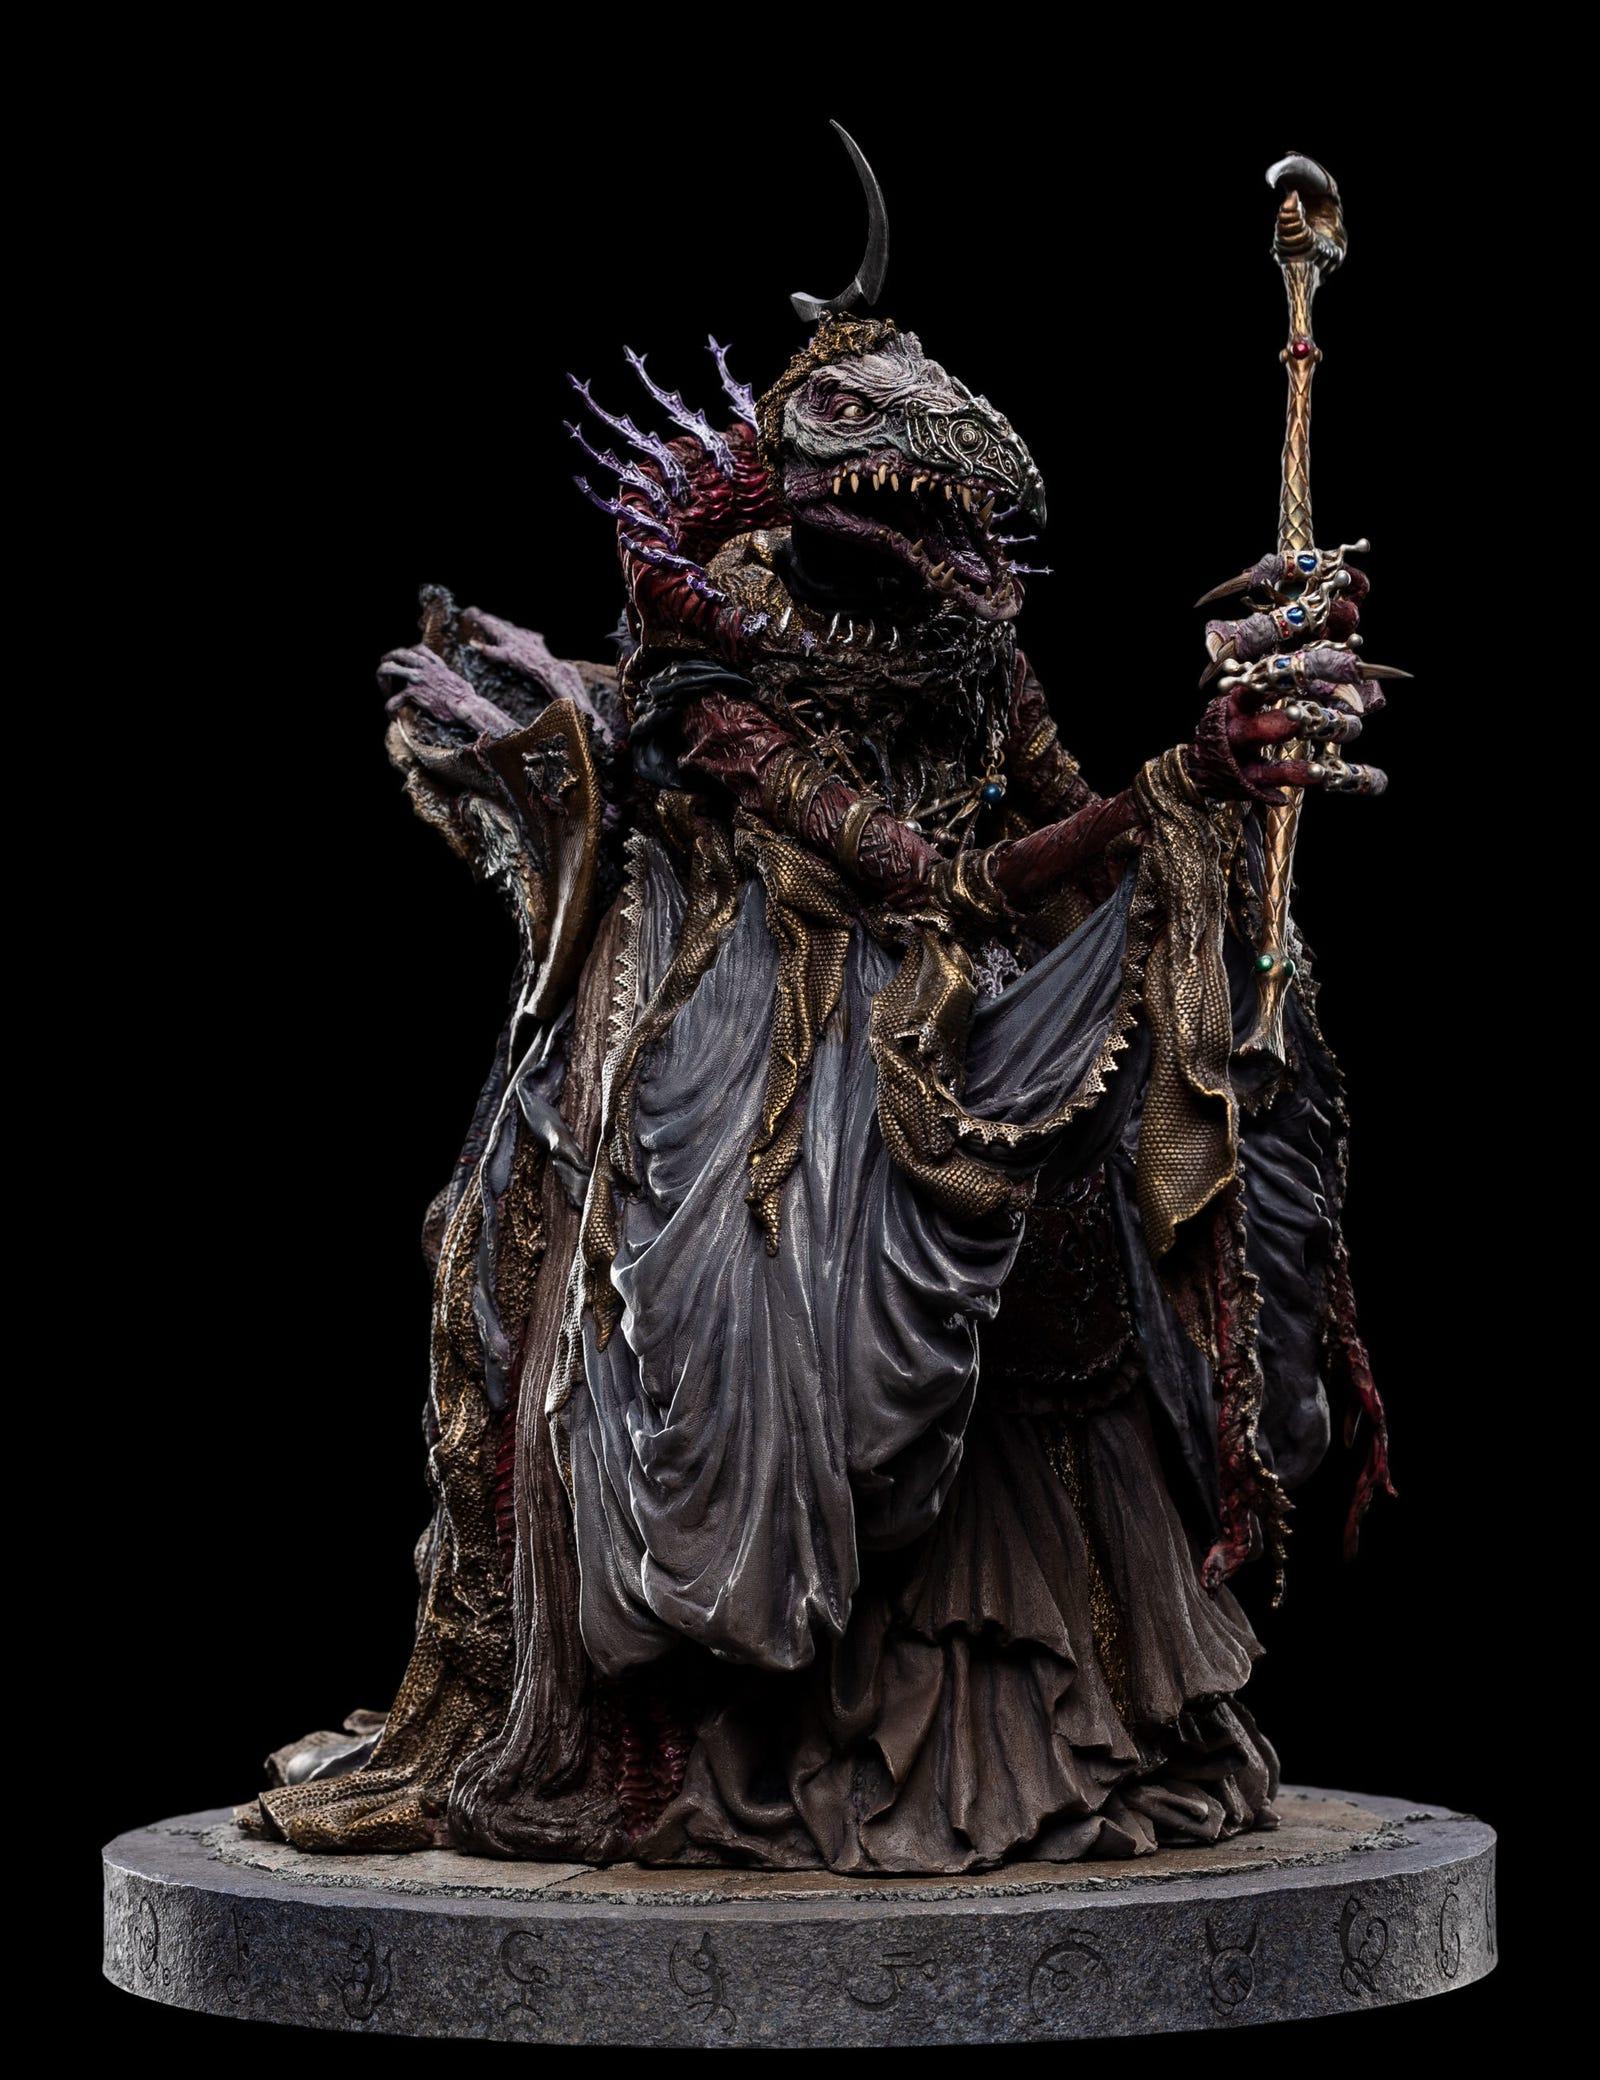 SKEKSO THE EMPEROR SKEKSIS 1:6 scale statue